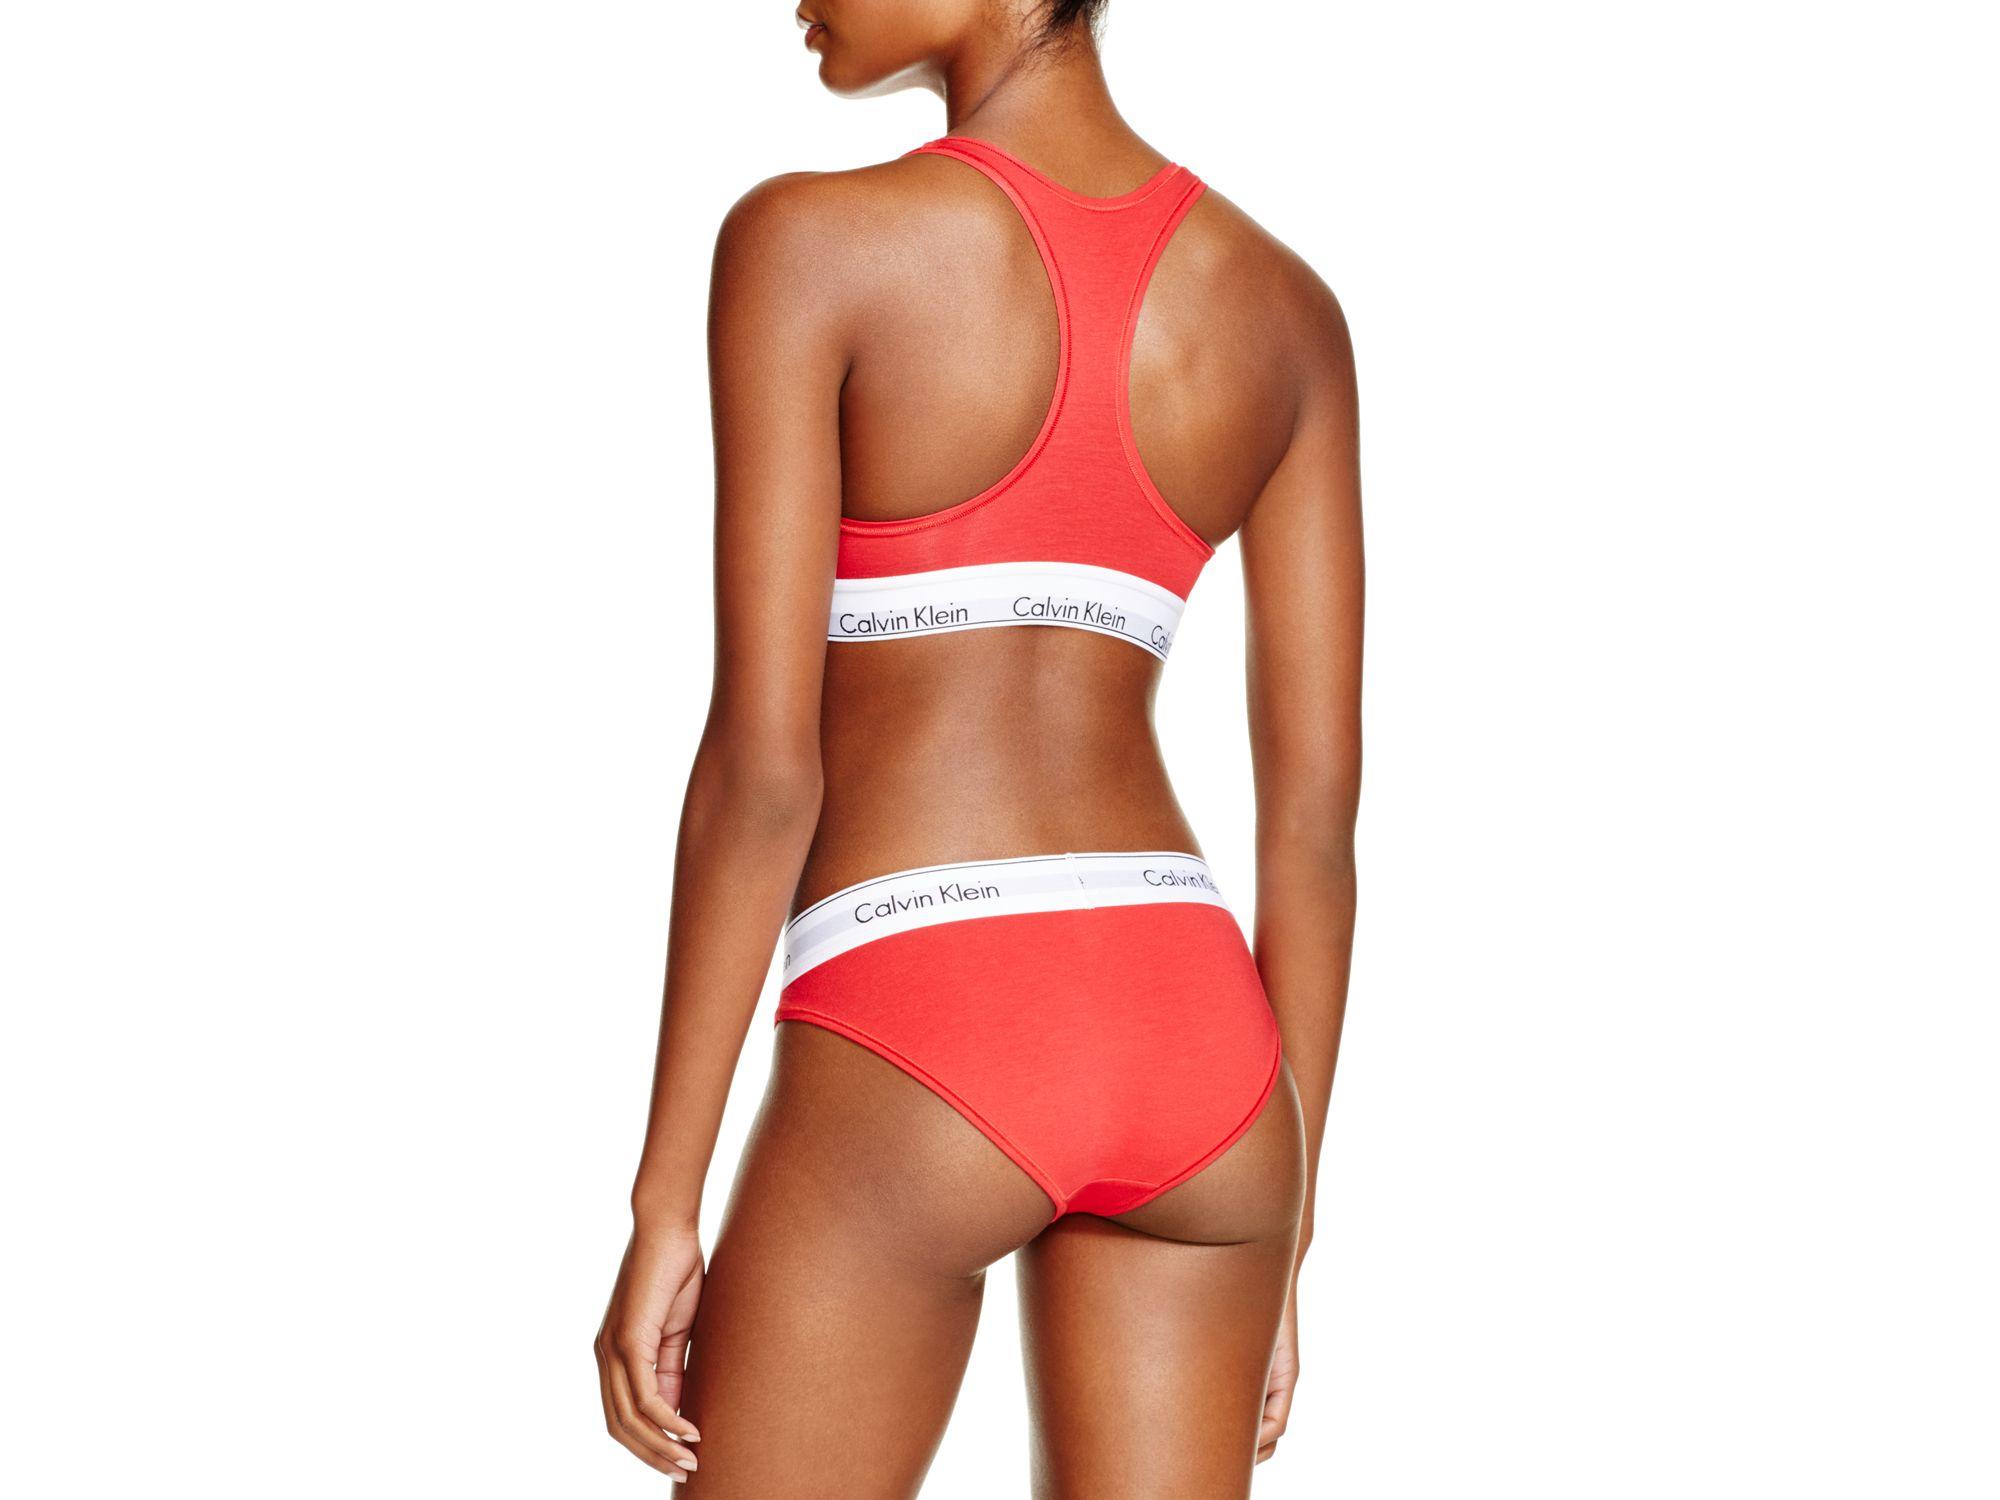 404f59c86b728 Calvin klein Modern Cotton Bralette And Bikini Gift Set  qset001 .